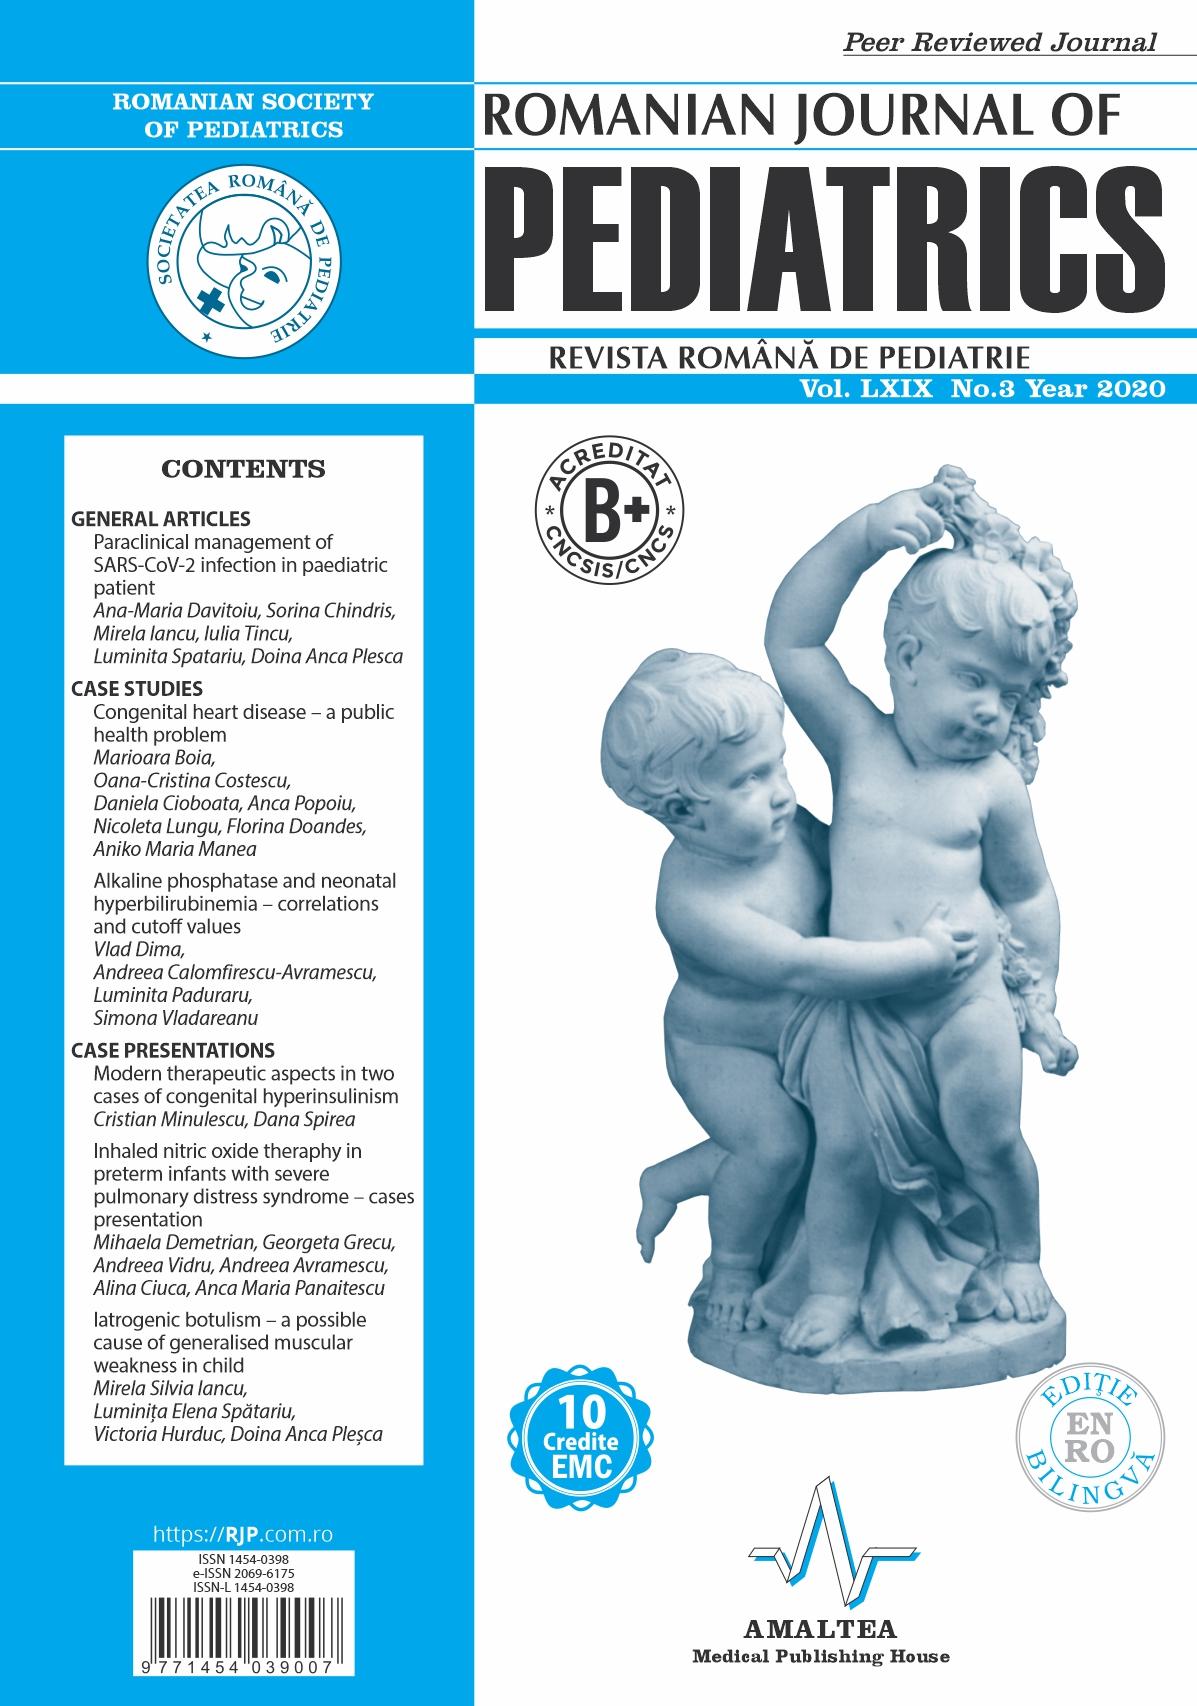 Romanian Journal of Pediatrics | Volume LXIX, No. 3, Year 2020